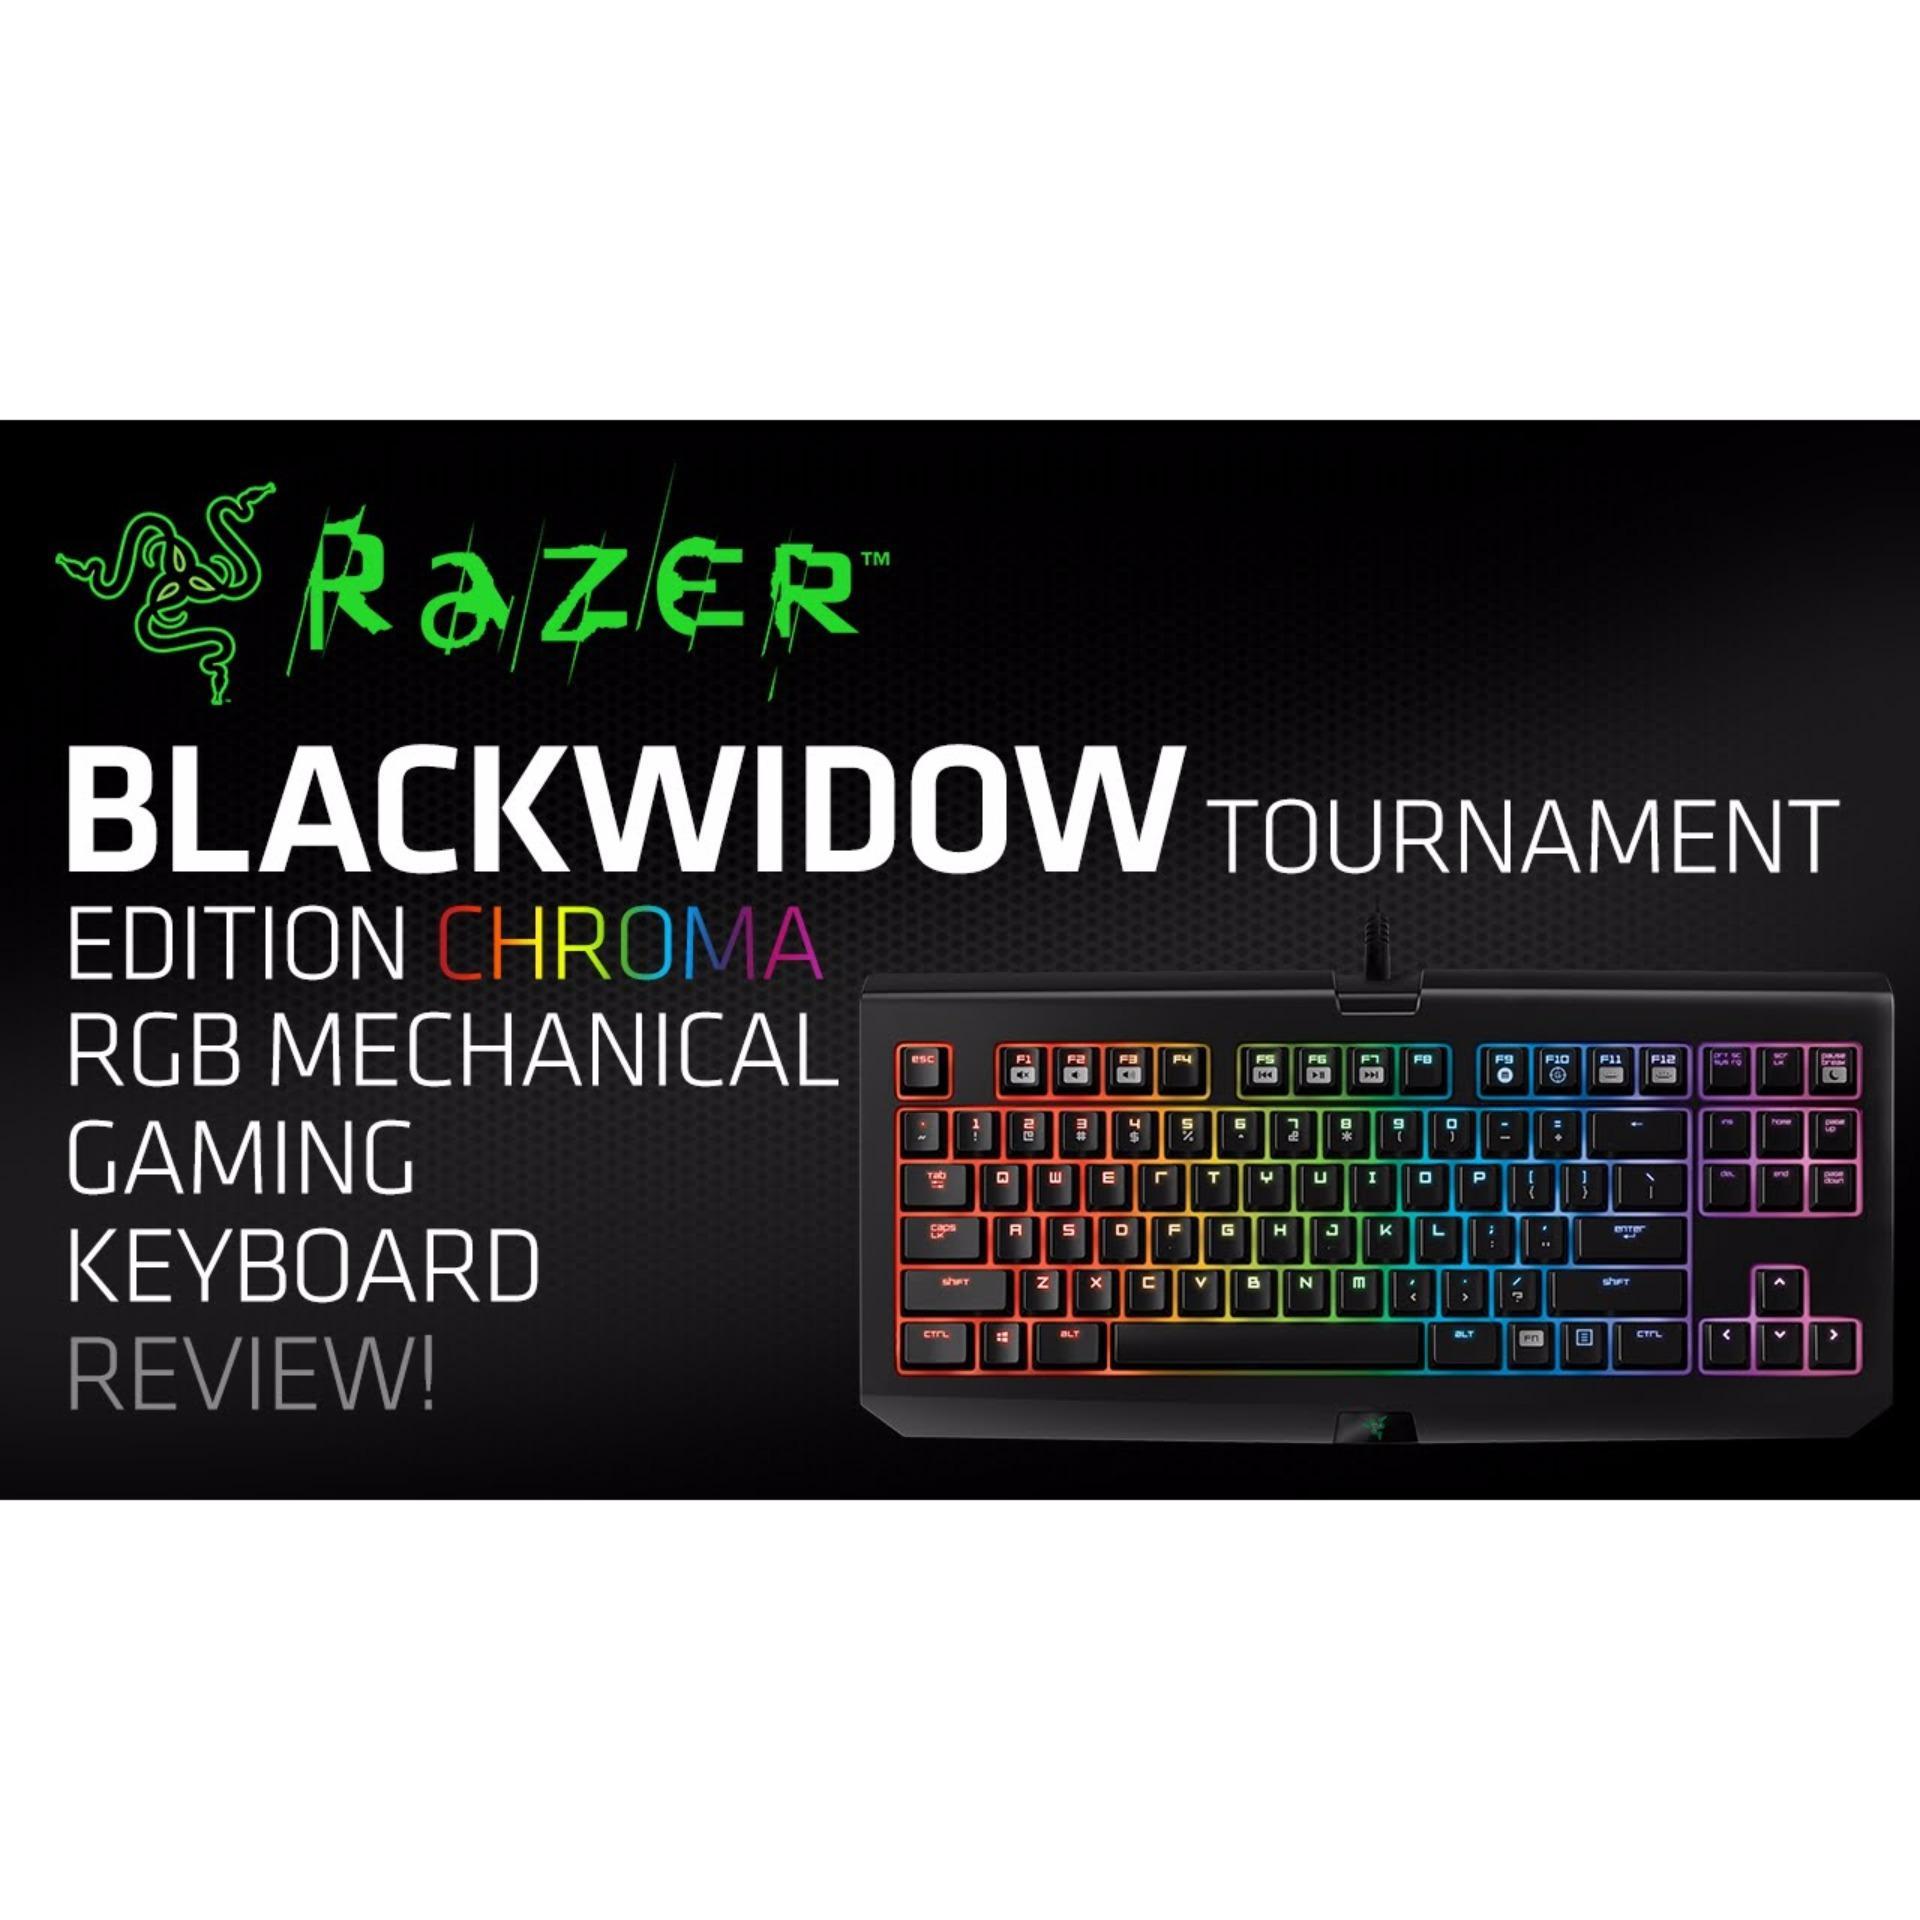 Razer Keyboard Blackwidow X Te Chroma Hitam Daftar Harga Terbaru Anansi Mmo Gaming Rz03 00550100 R3m1 Tournament Edition Mechanical